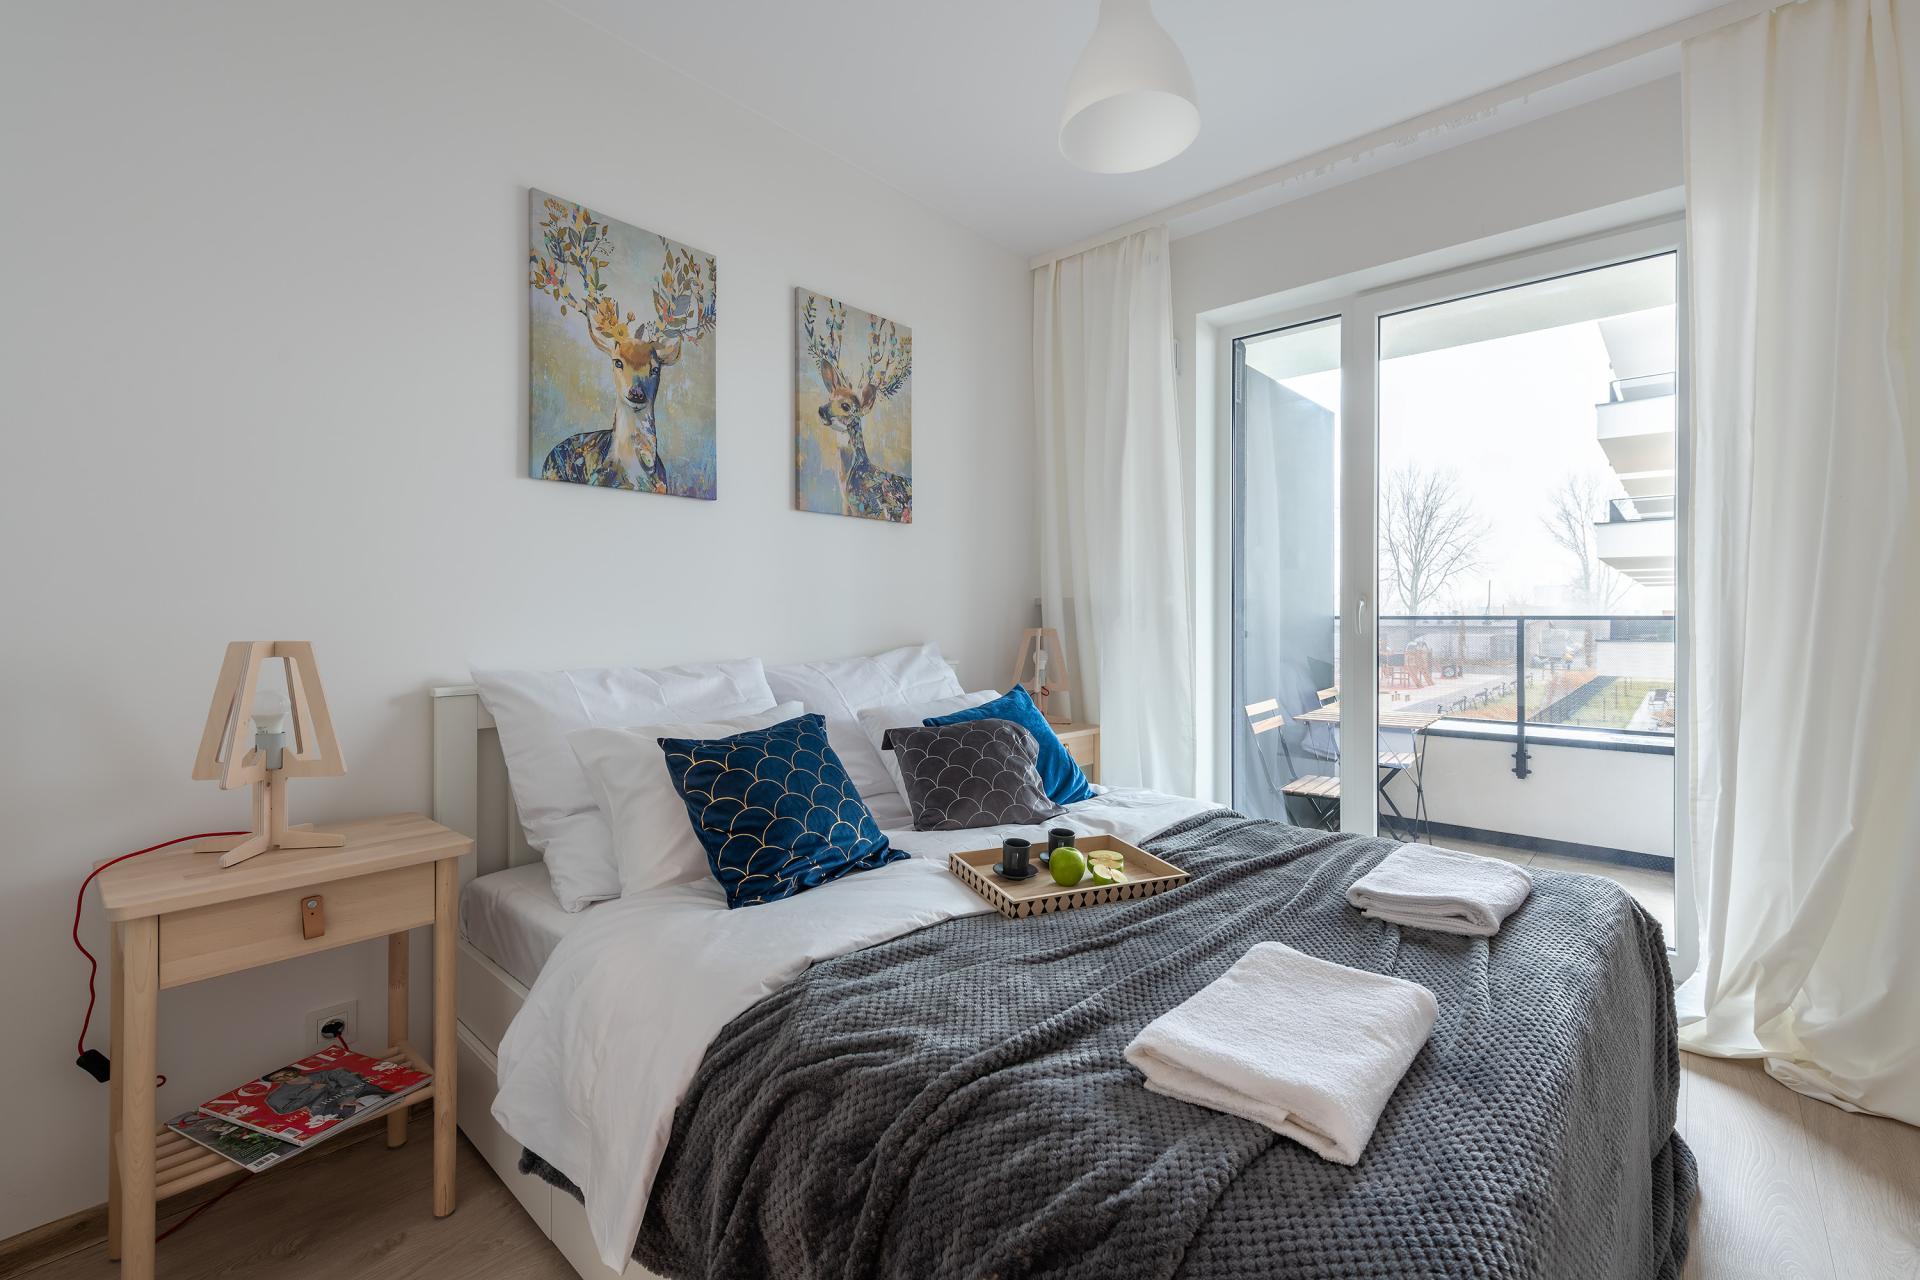 Bedroom at Cybernetyki Apartments, Sluzewiec, Warsaw